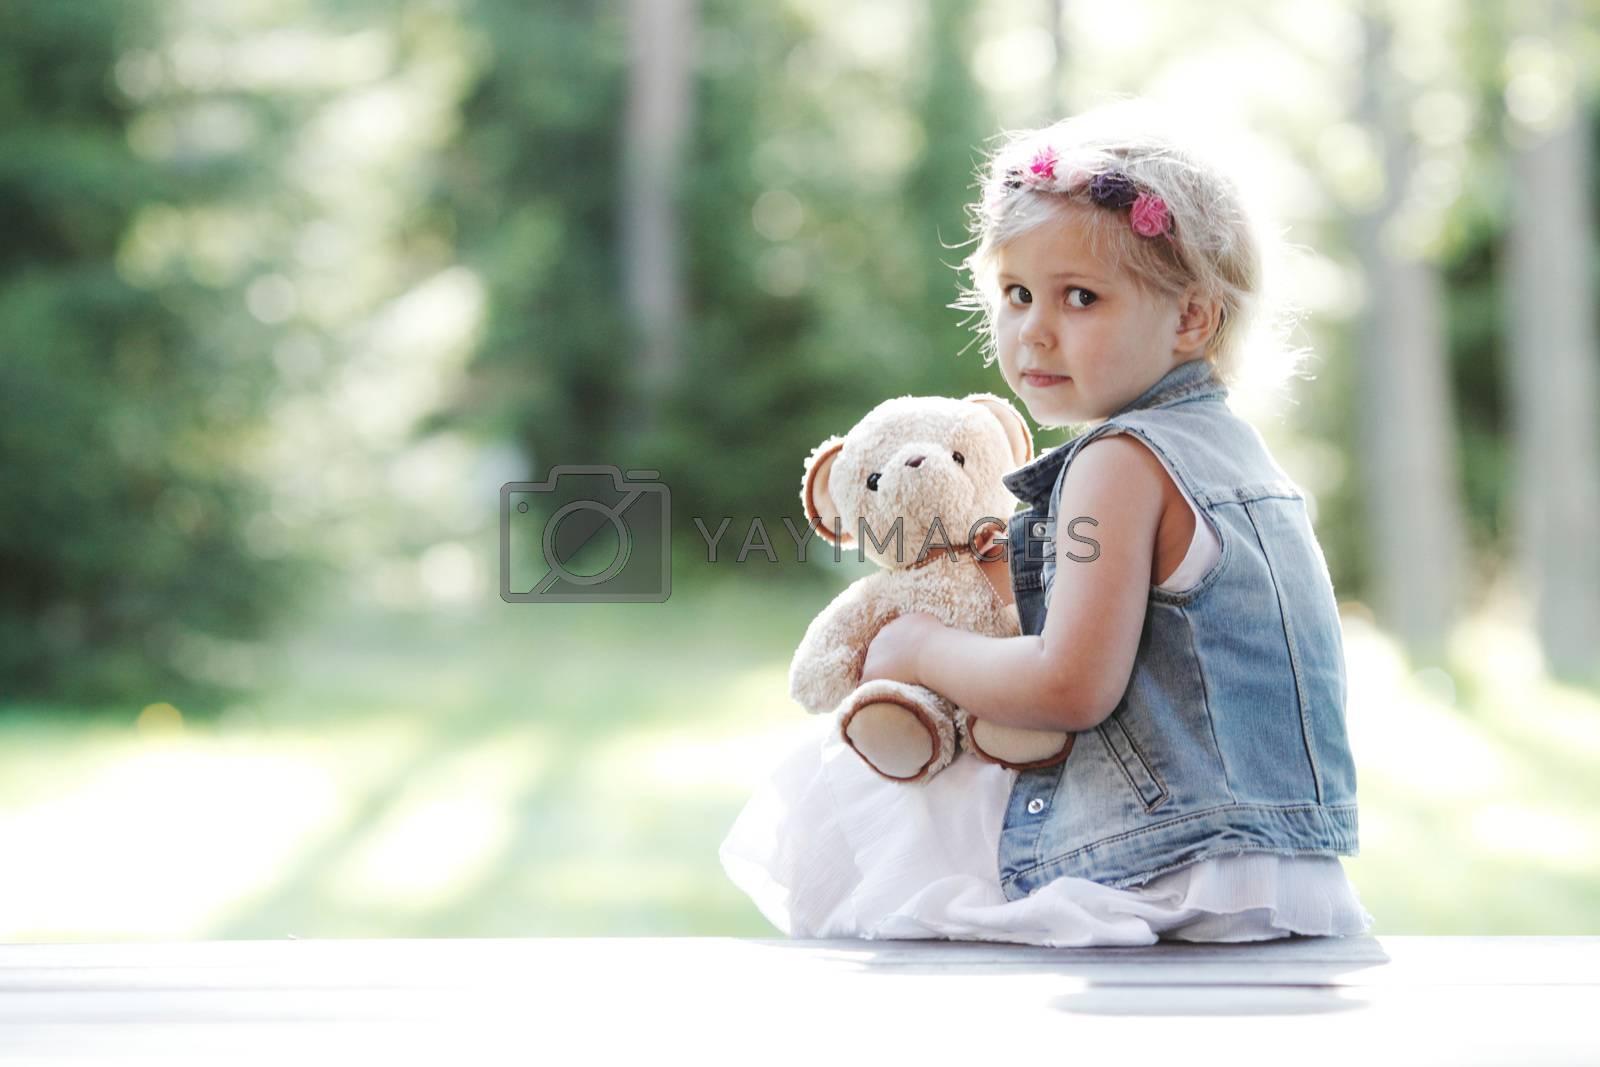 Worried Little girl holding her Teddy bear sitting outdoors